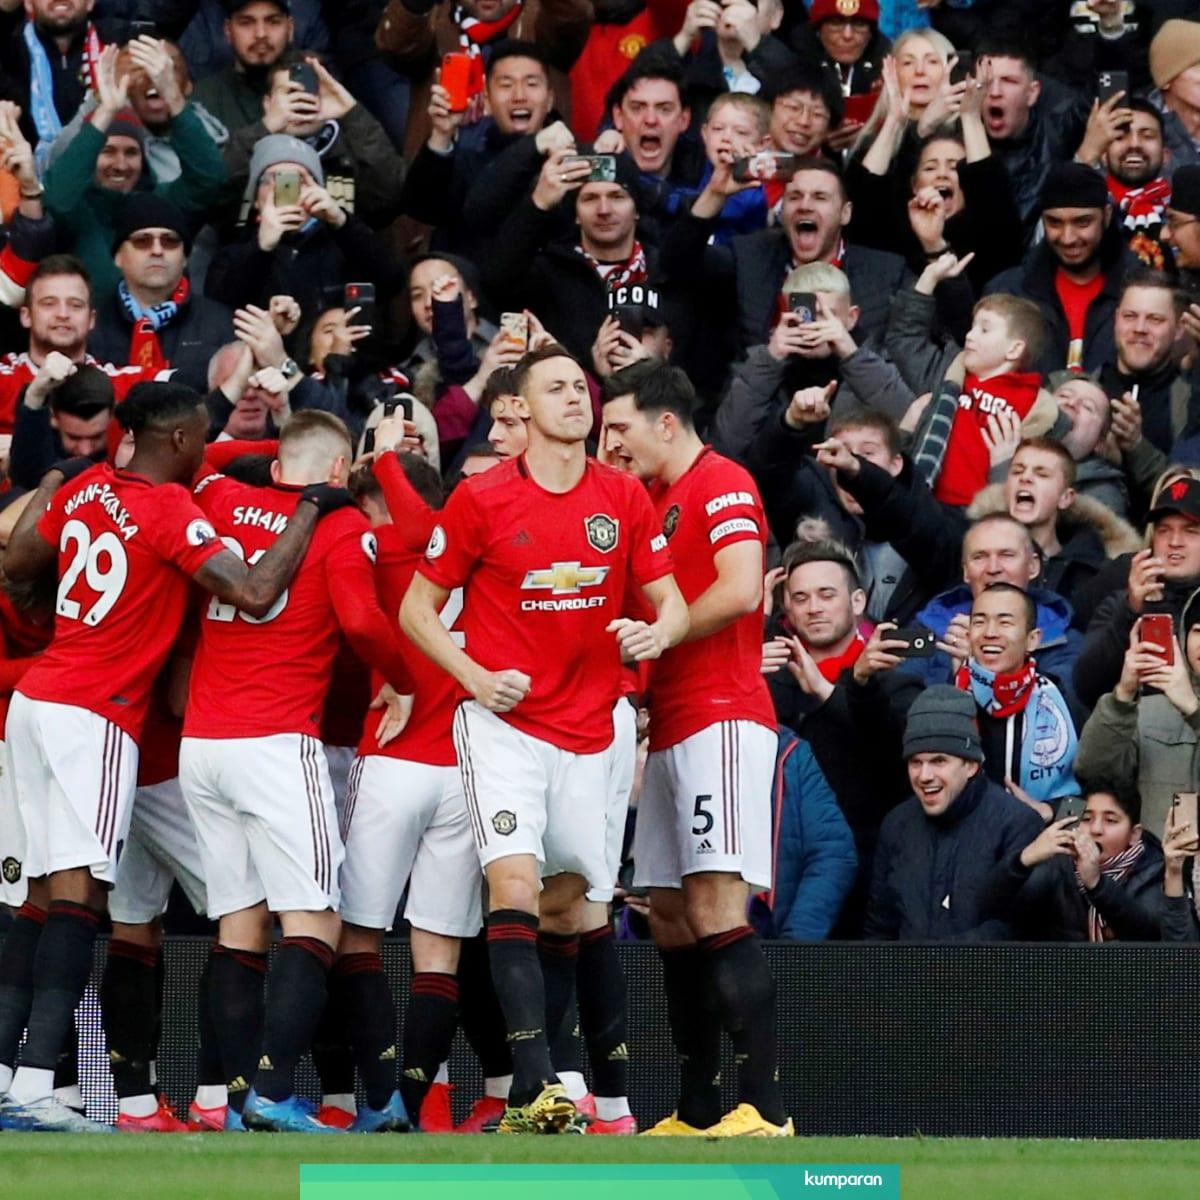 Keane Man United Sudah Membaik Tetapi Masih Tertinggal